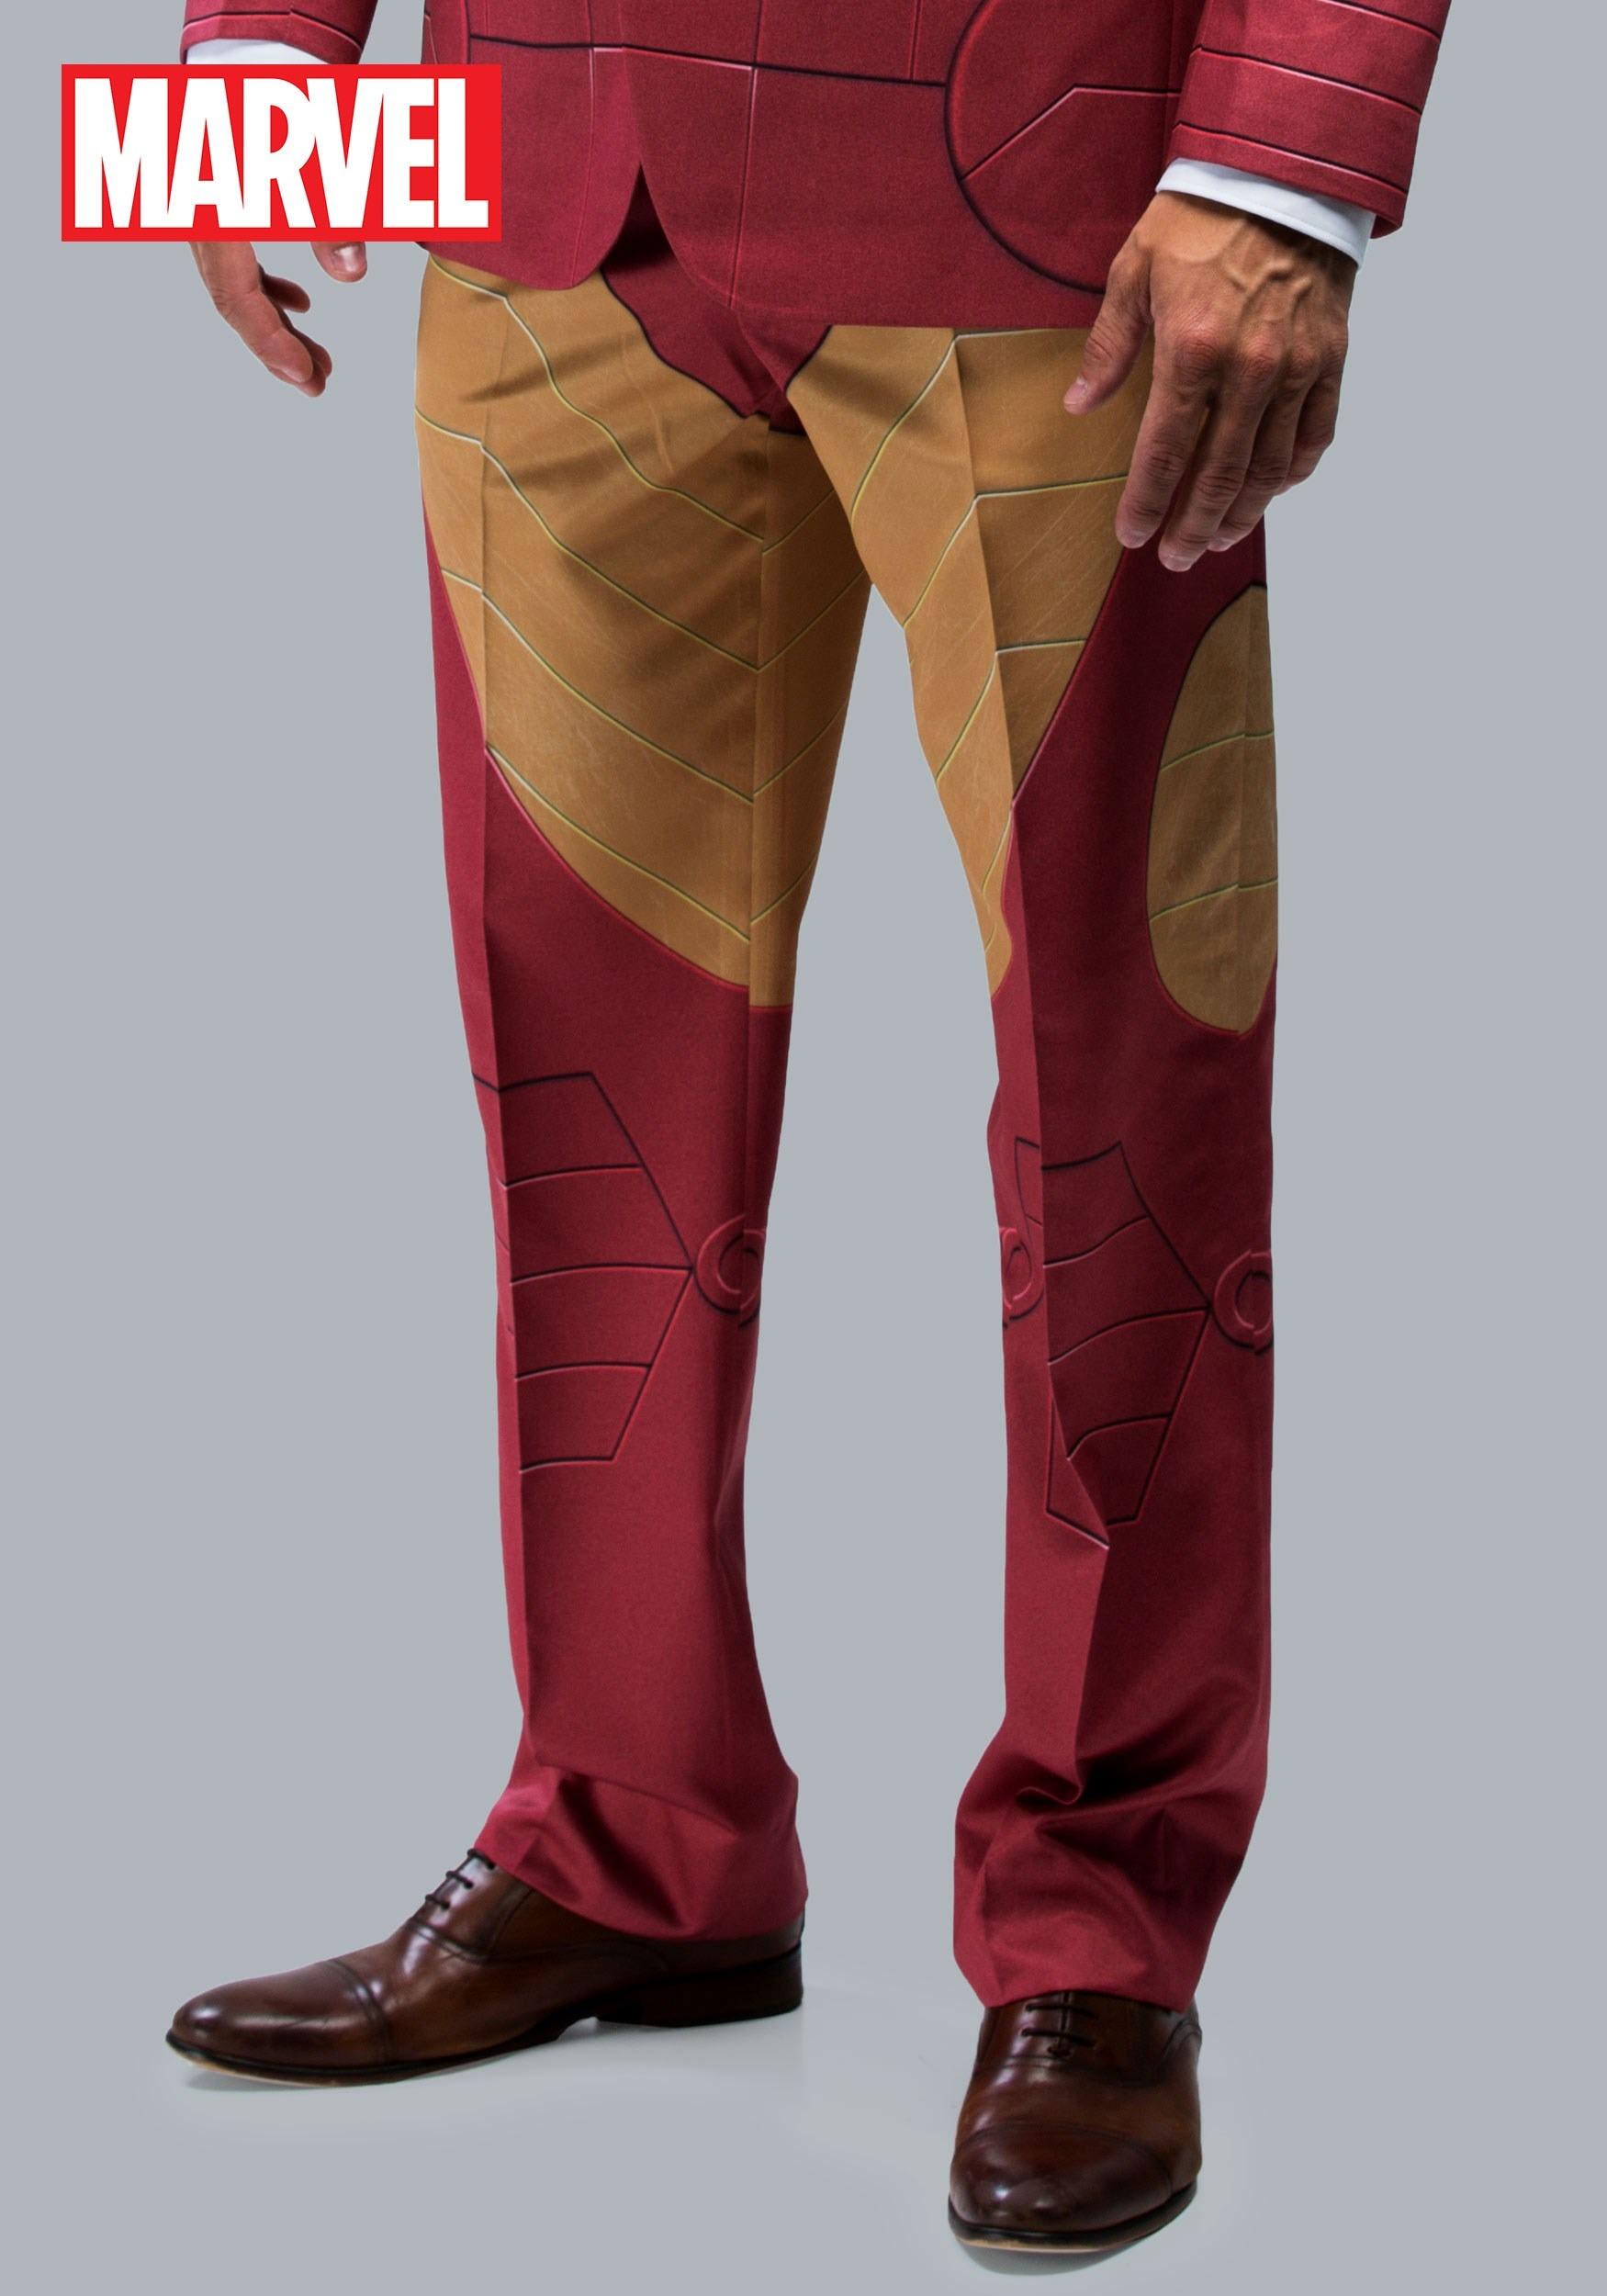 Iron Man Suit Pants (Alter Ego) & Iron Man Costumes - Adult Child Iron Man Movie Costume